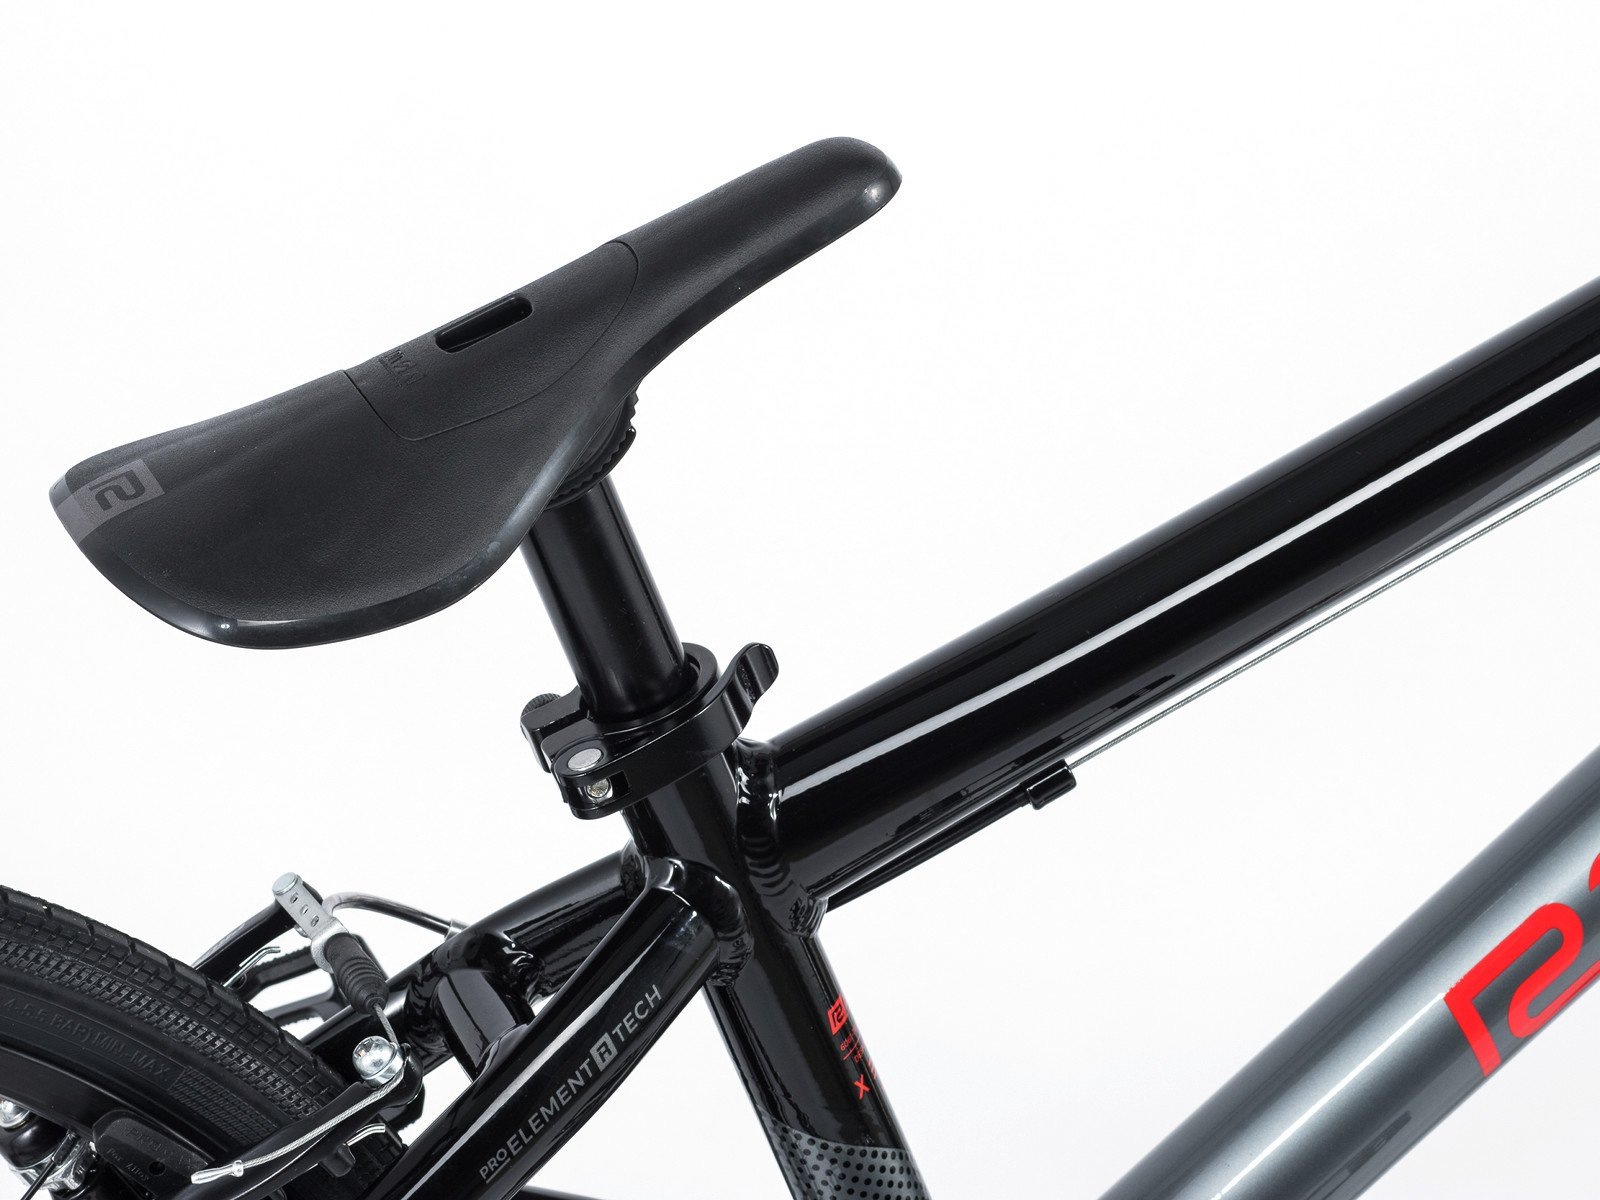 ALLOY SEATPOST 29.2mm Black /& Silver MTB BMX Cruiser Bike Bicycle Cycling New